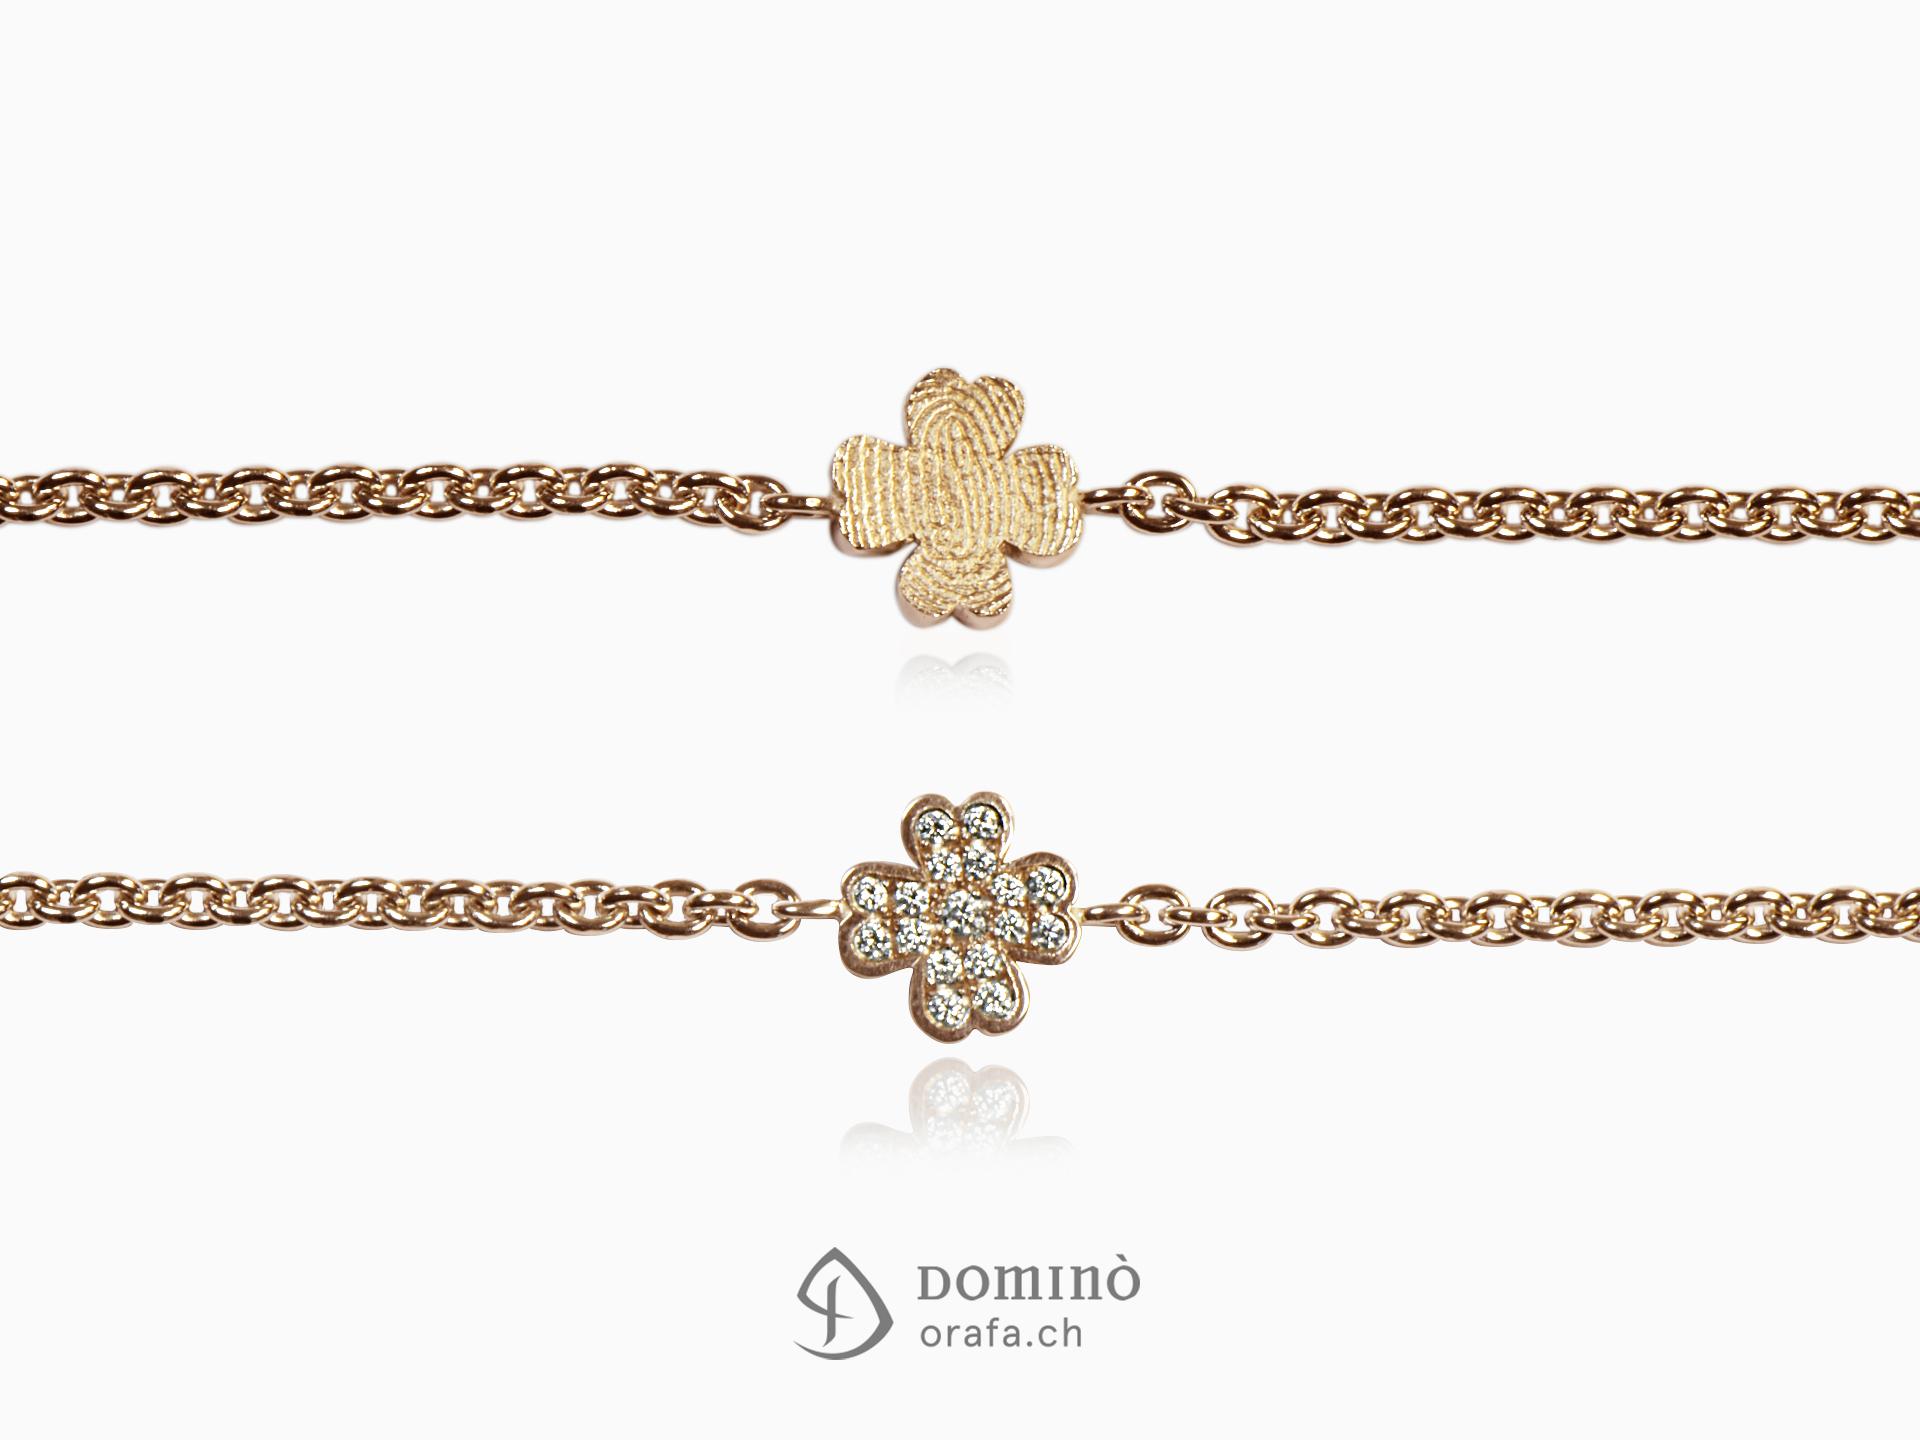 Four leaf clover bracelet with diamonds and fingerprint